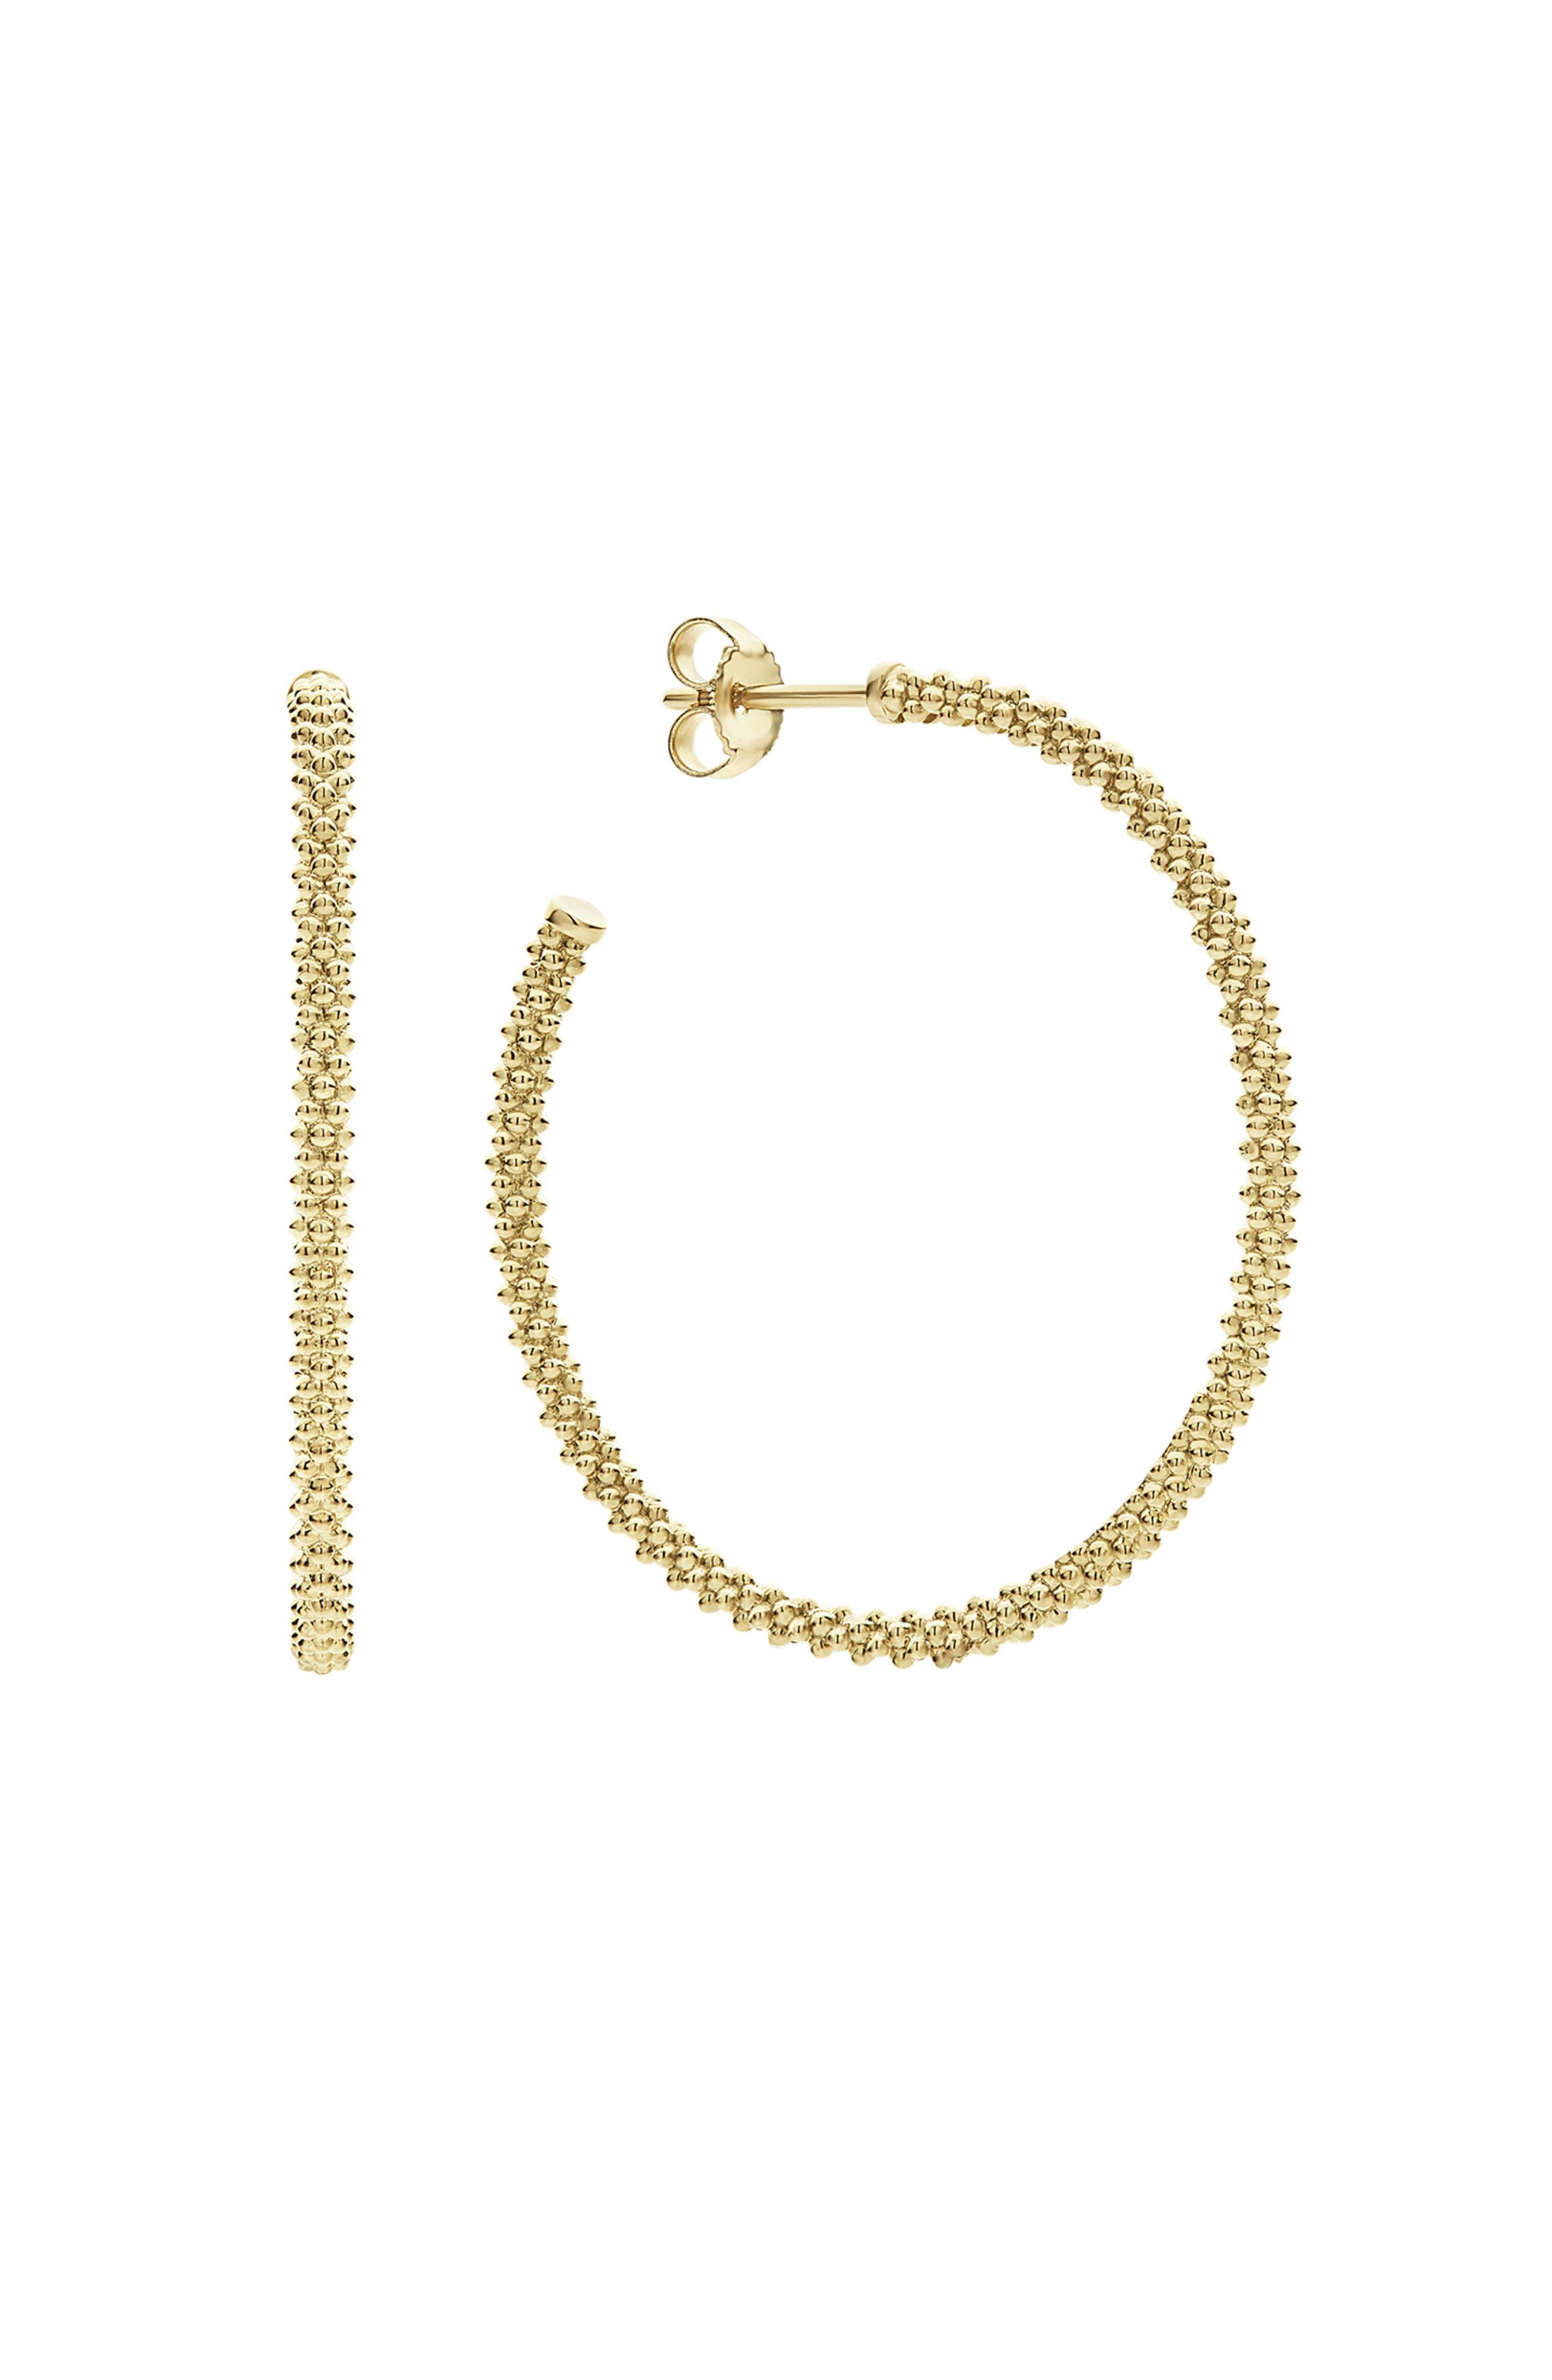 Caviar Hoop Earrings,                             Alternate thumbnail 2, color,                             GOLD